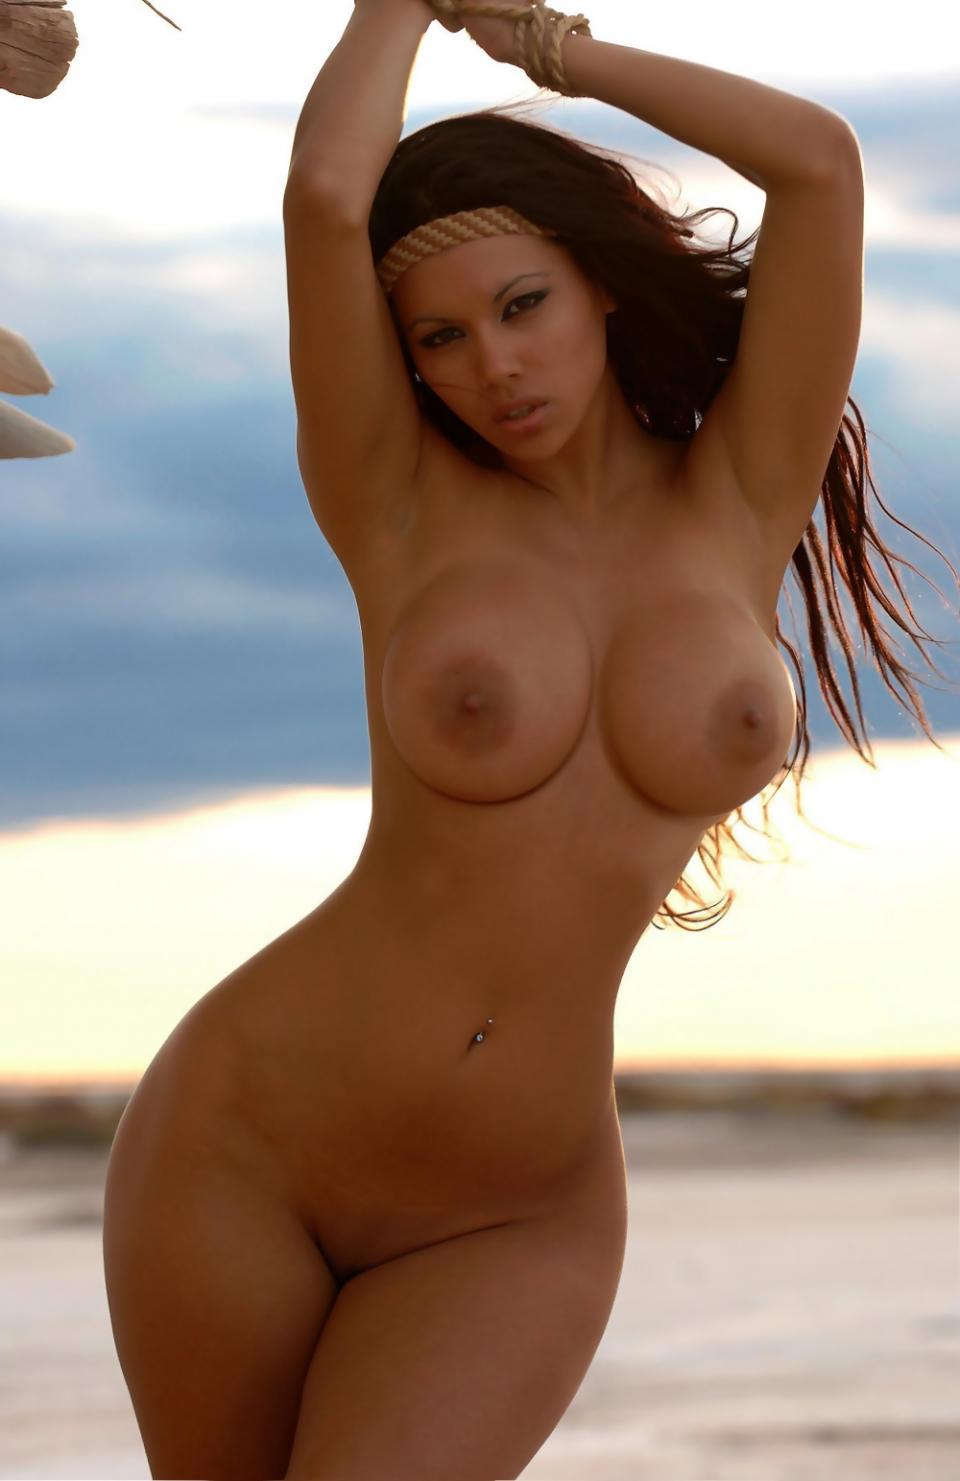 Celebrities with hourglass figures nude confirm